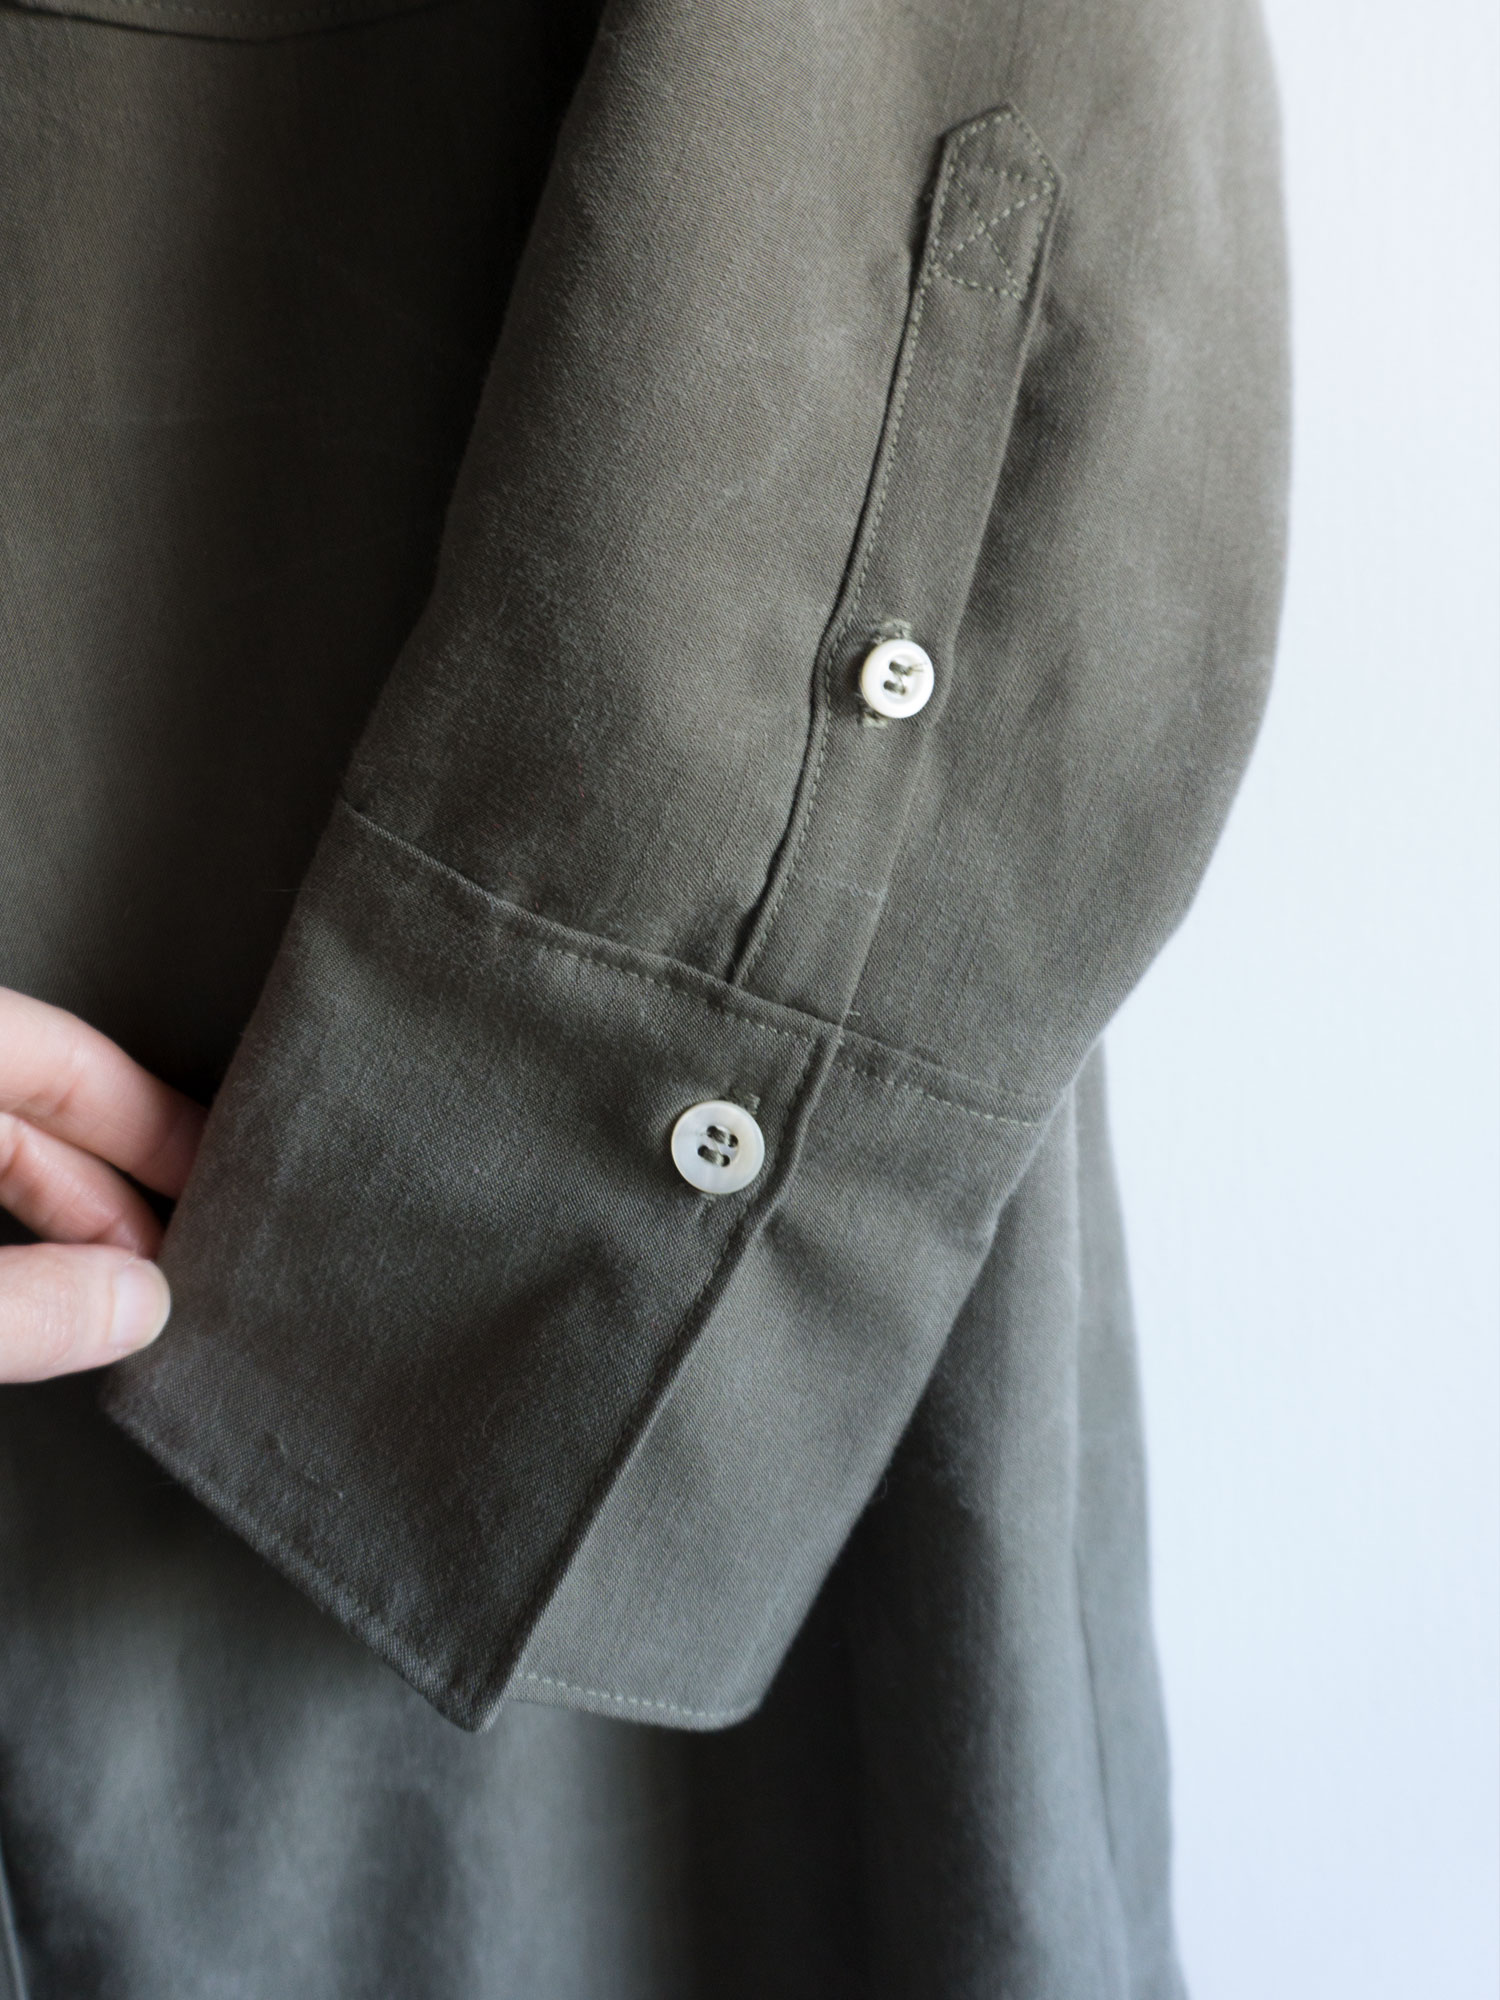 Kalle Shirtdress Sleeve Expansion Pattern by Closet Case Patterns   Sew DIY